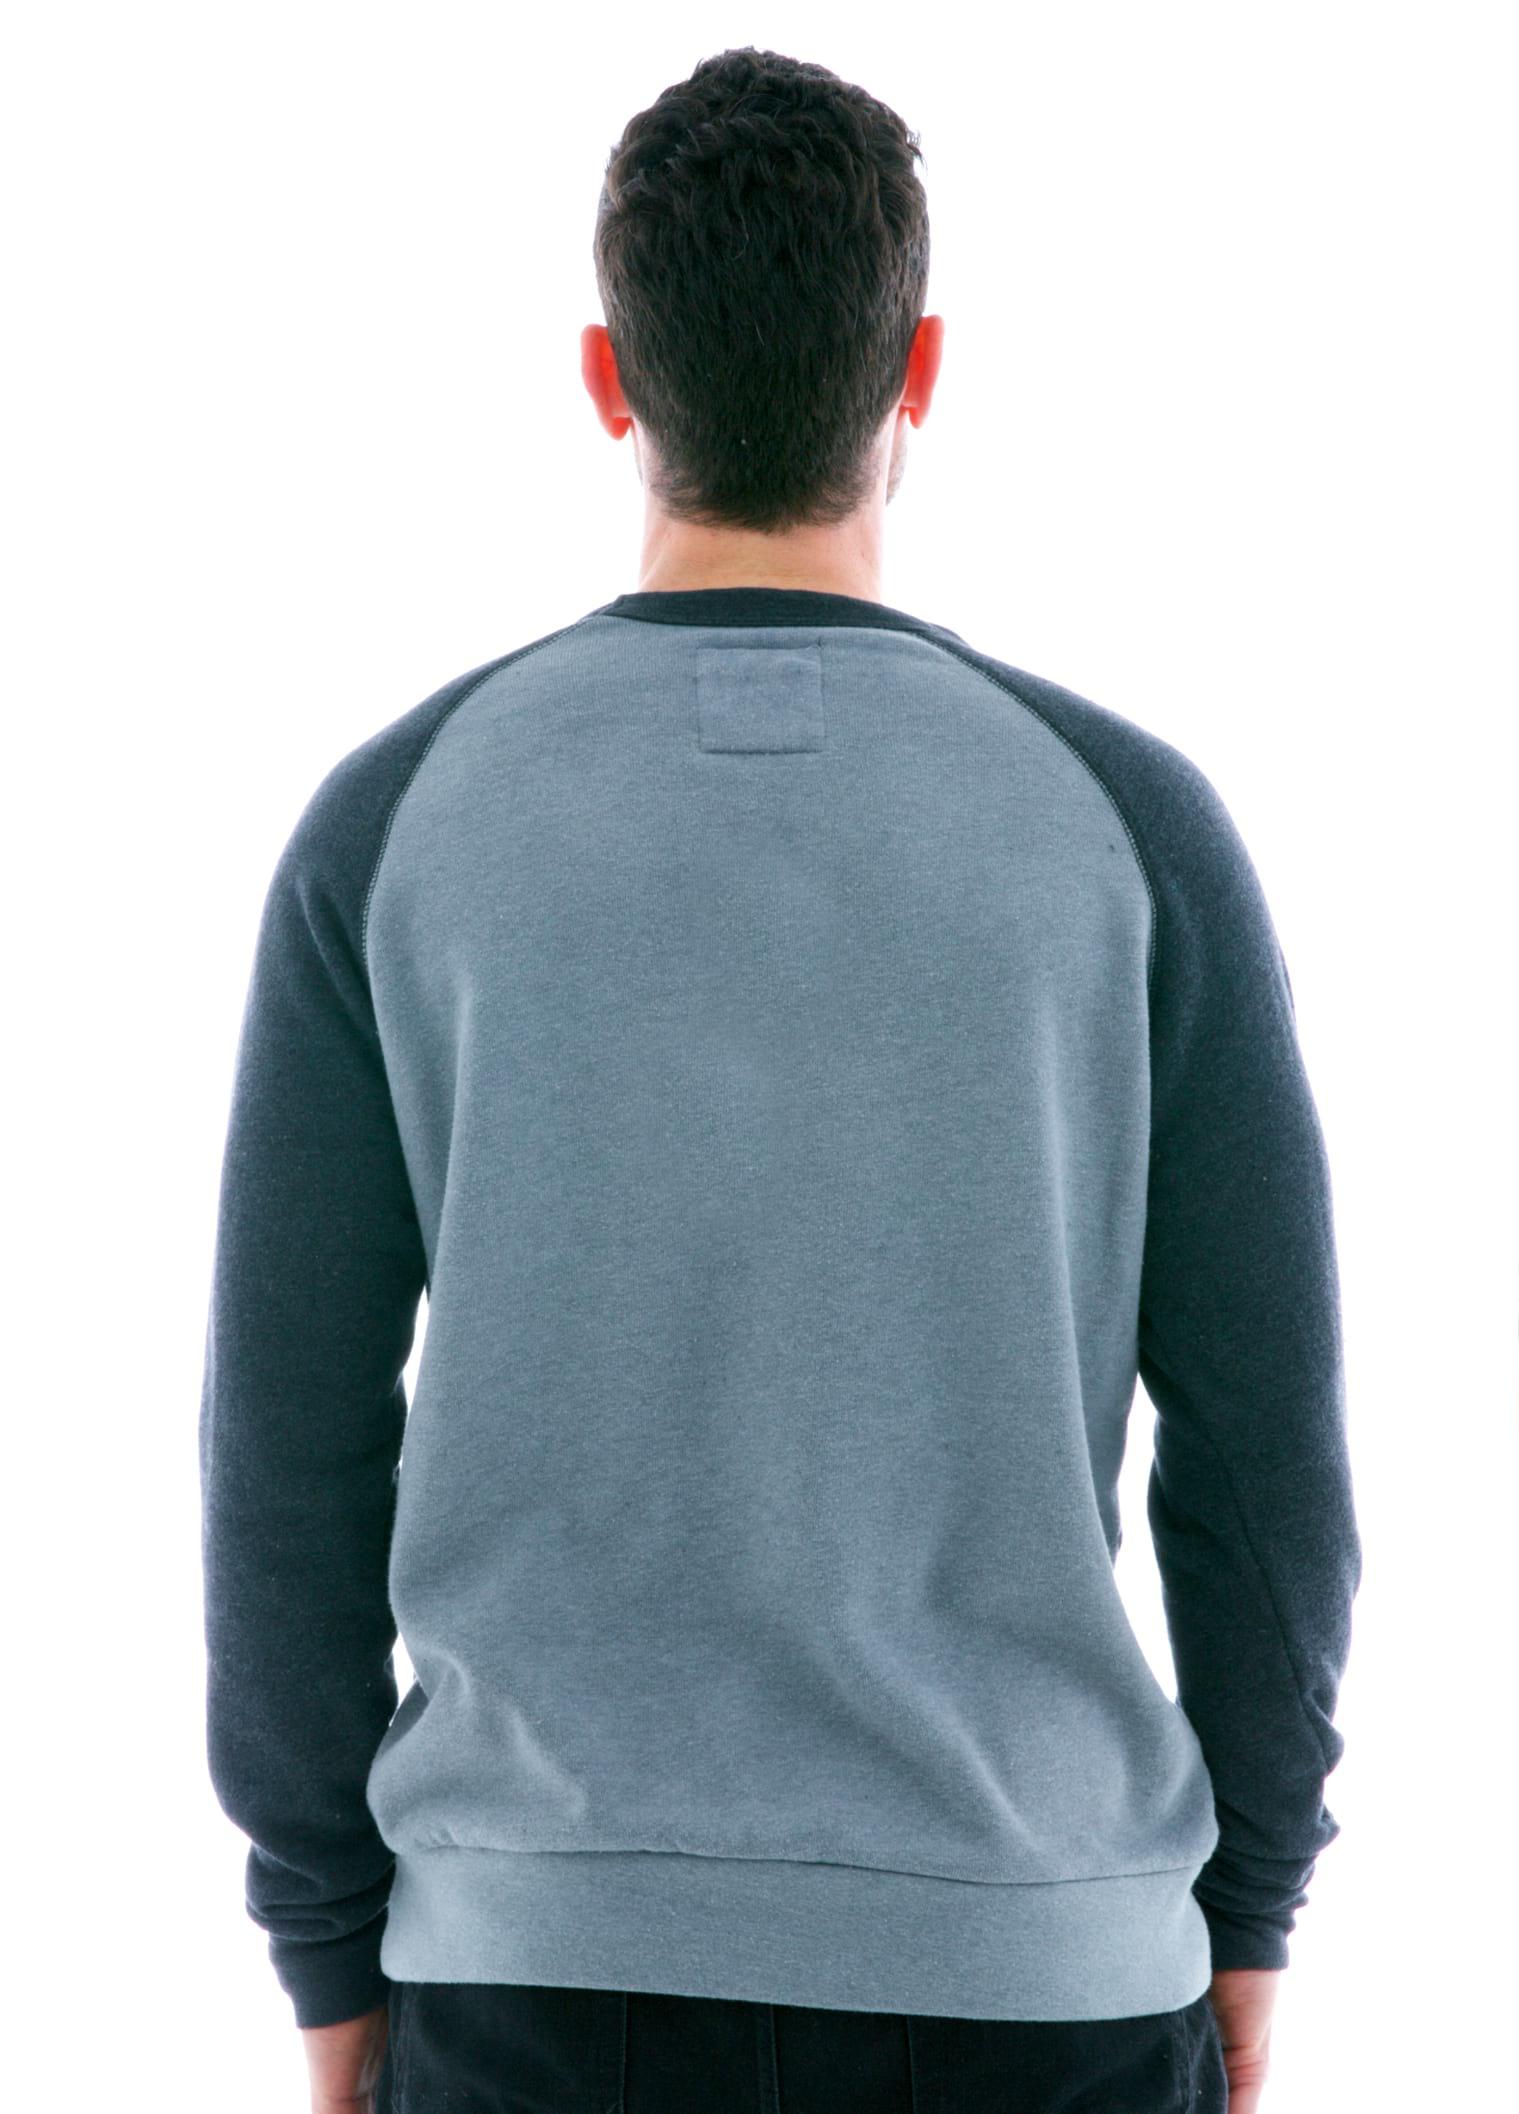 Men's Contrast Sleeve Old School Long Sleeve Raglan T-Shirt Back View